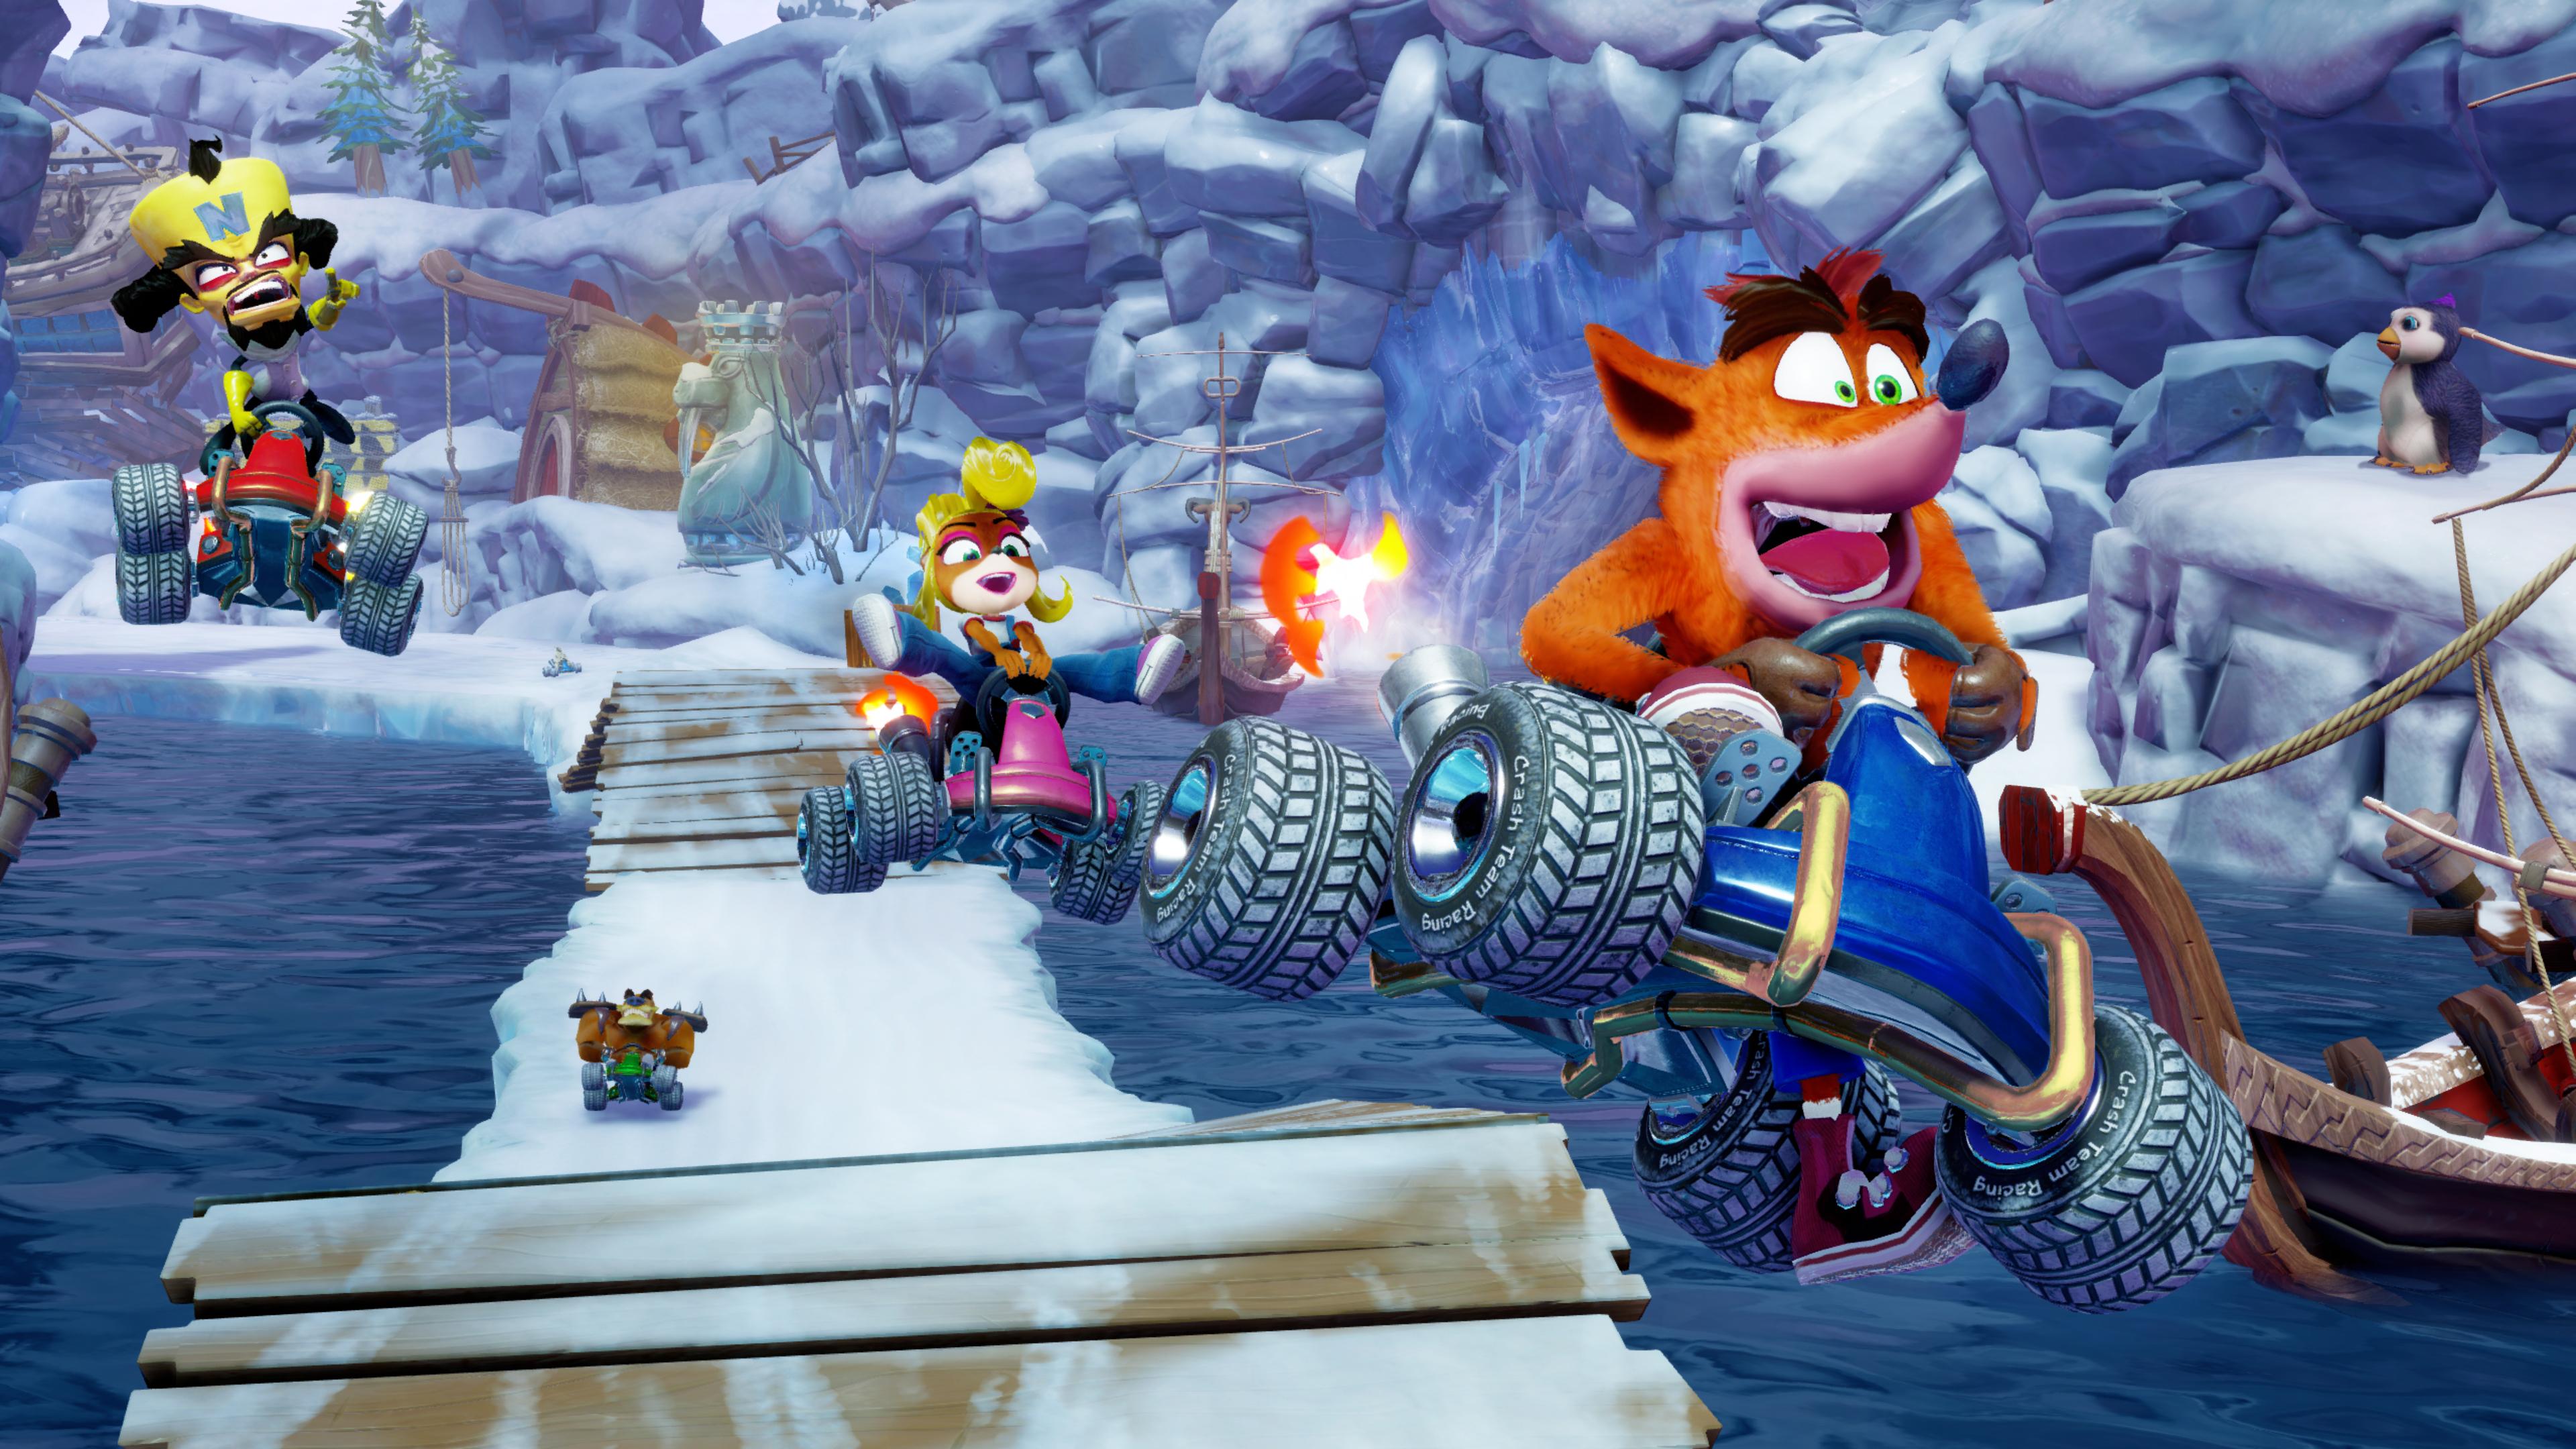 Crash Team Racing Nitro Fueled The Game Awards 2018 4k Ultra HD 3840x2160